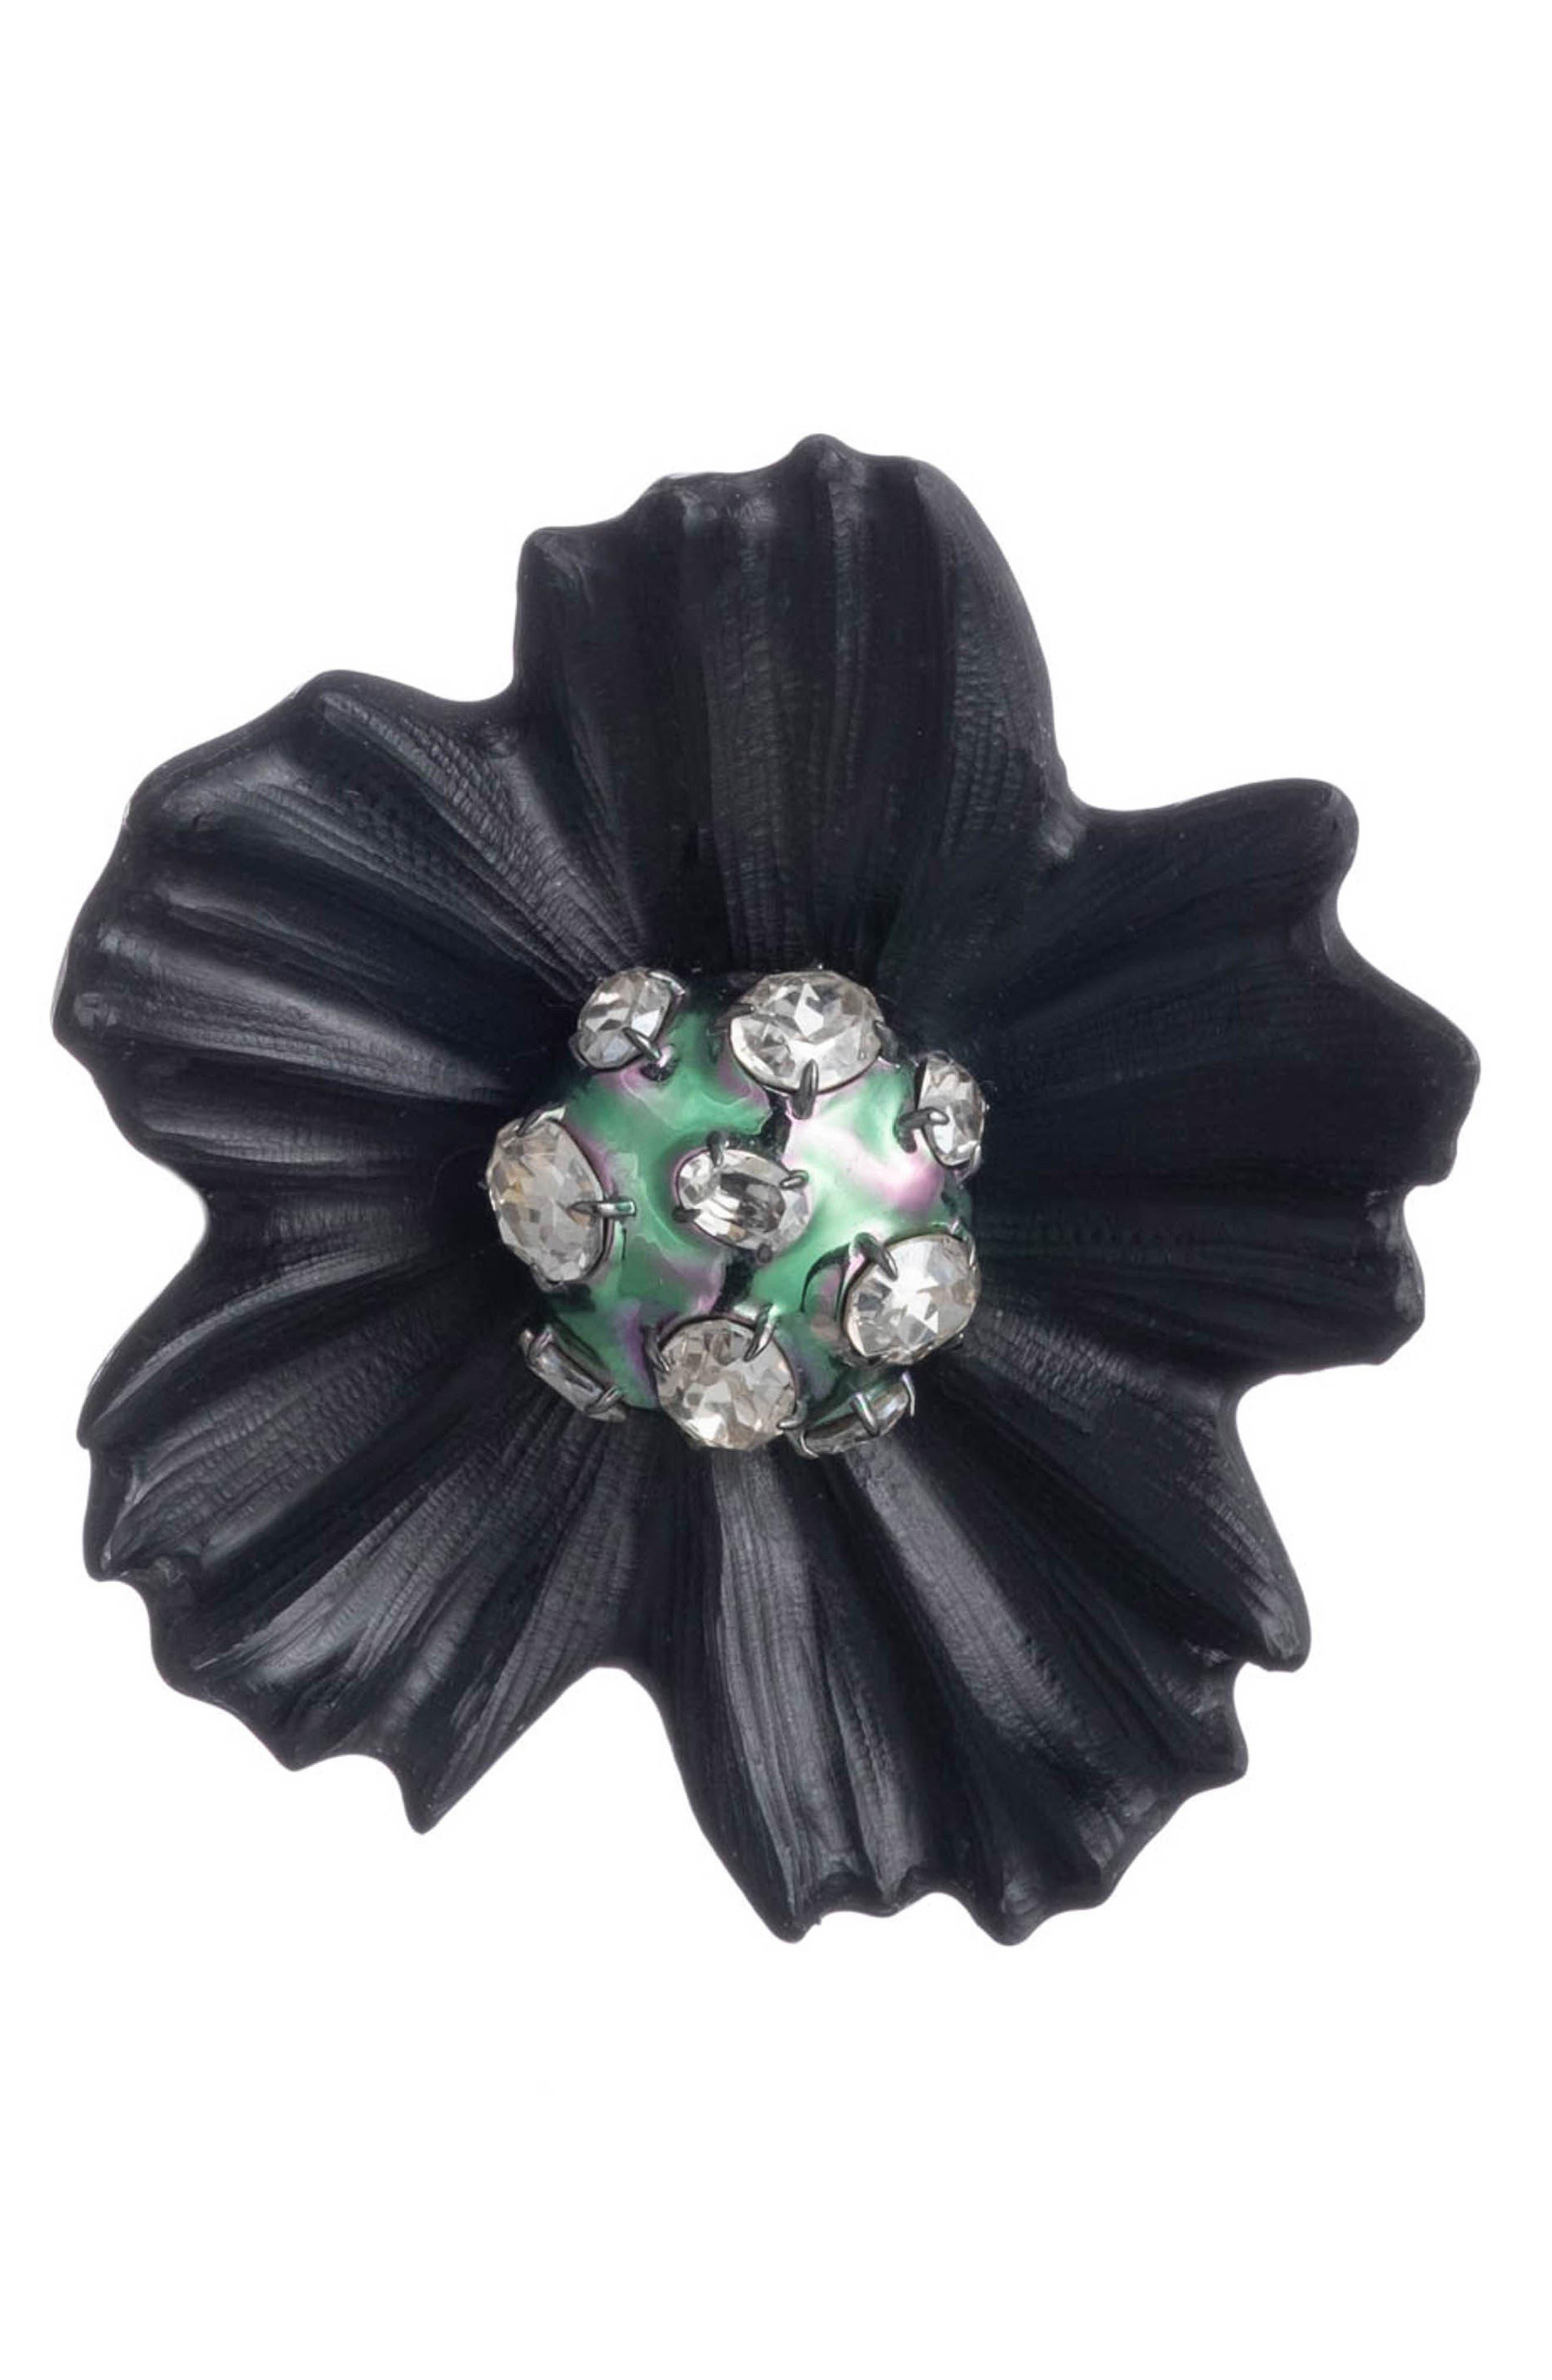 475ec8724 Pins All Women | Nordstrom